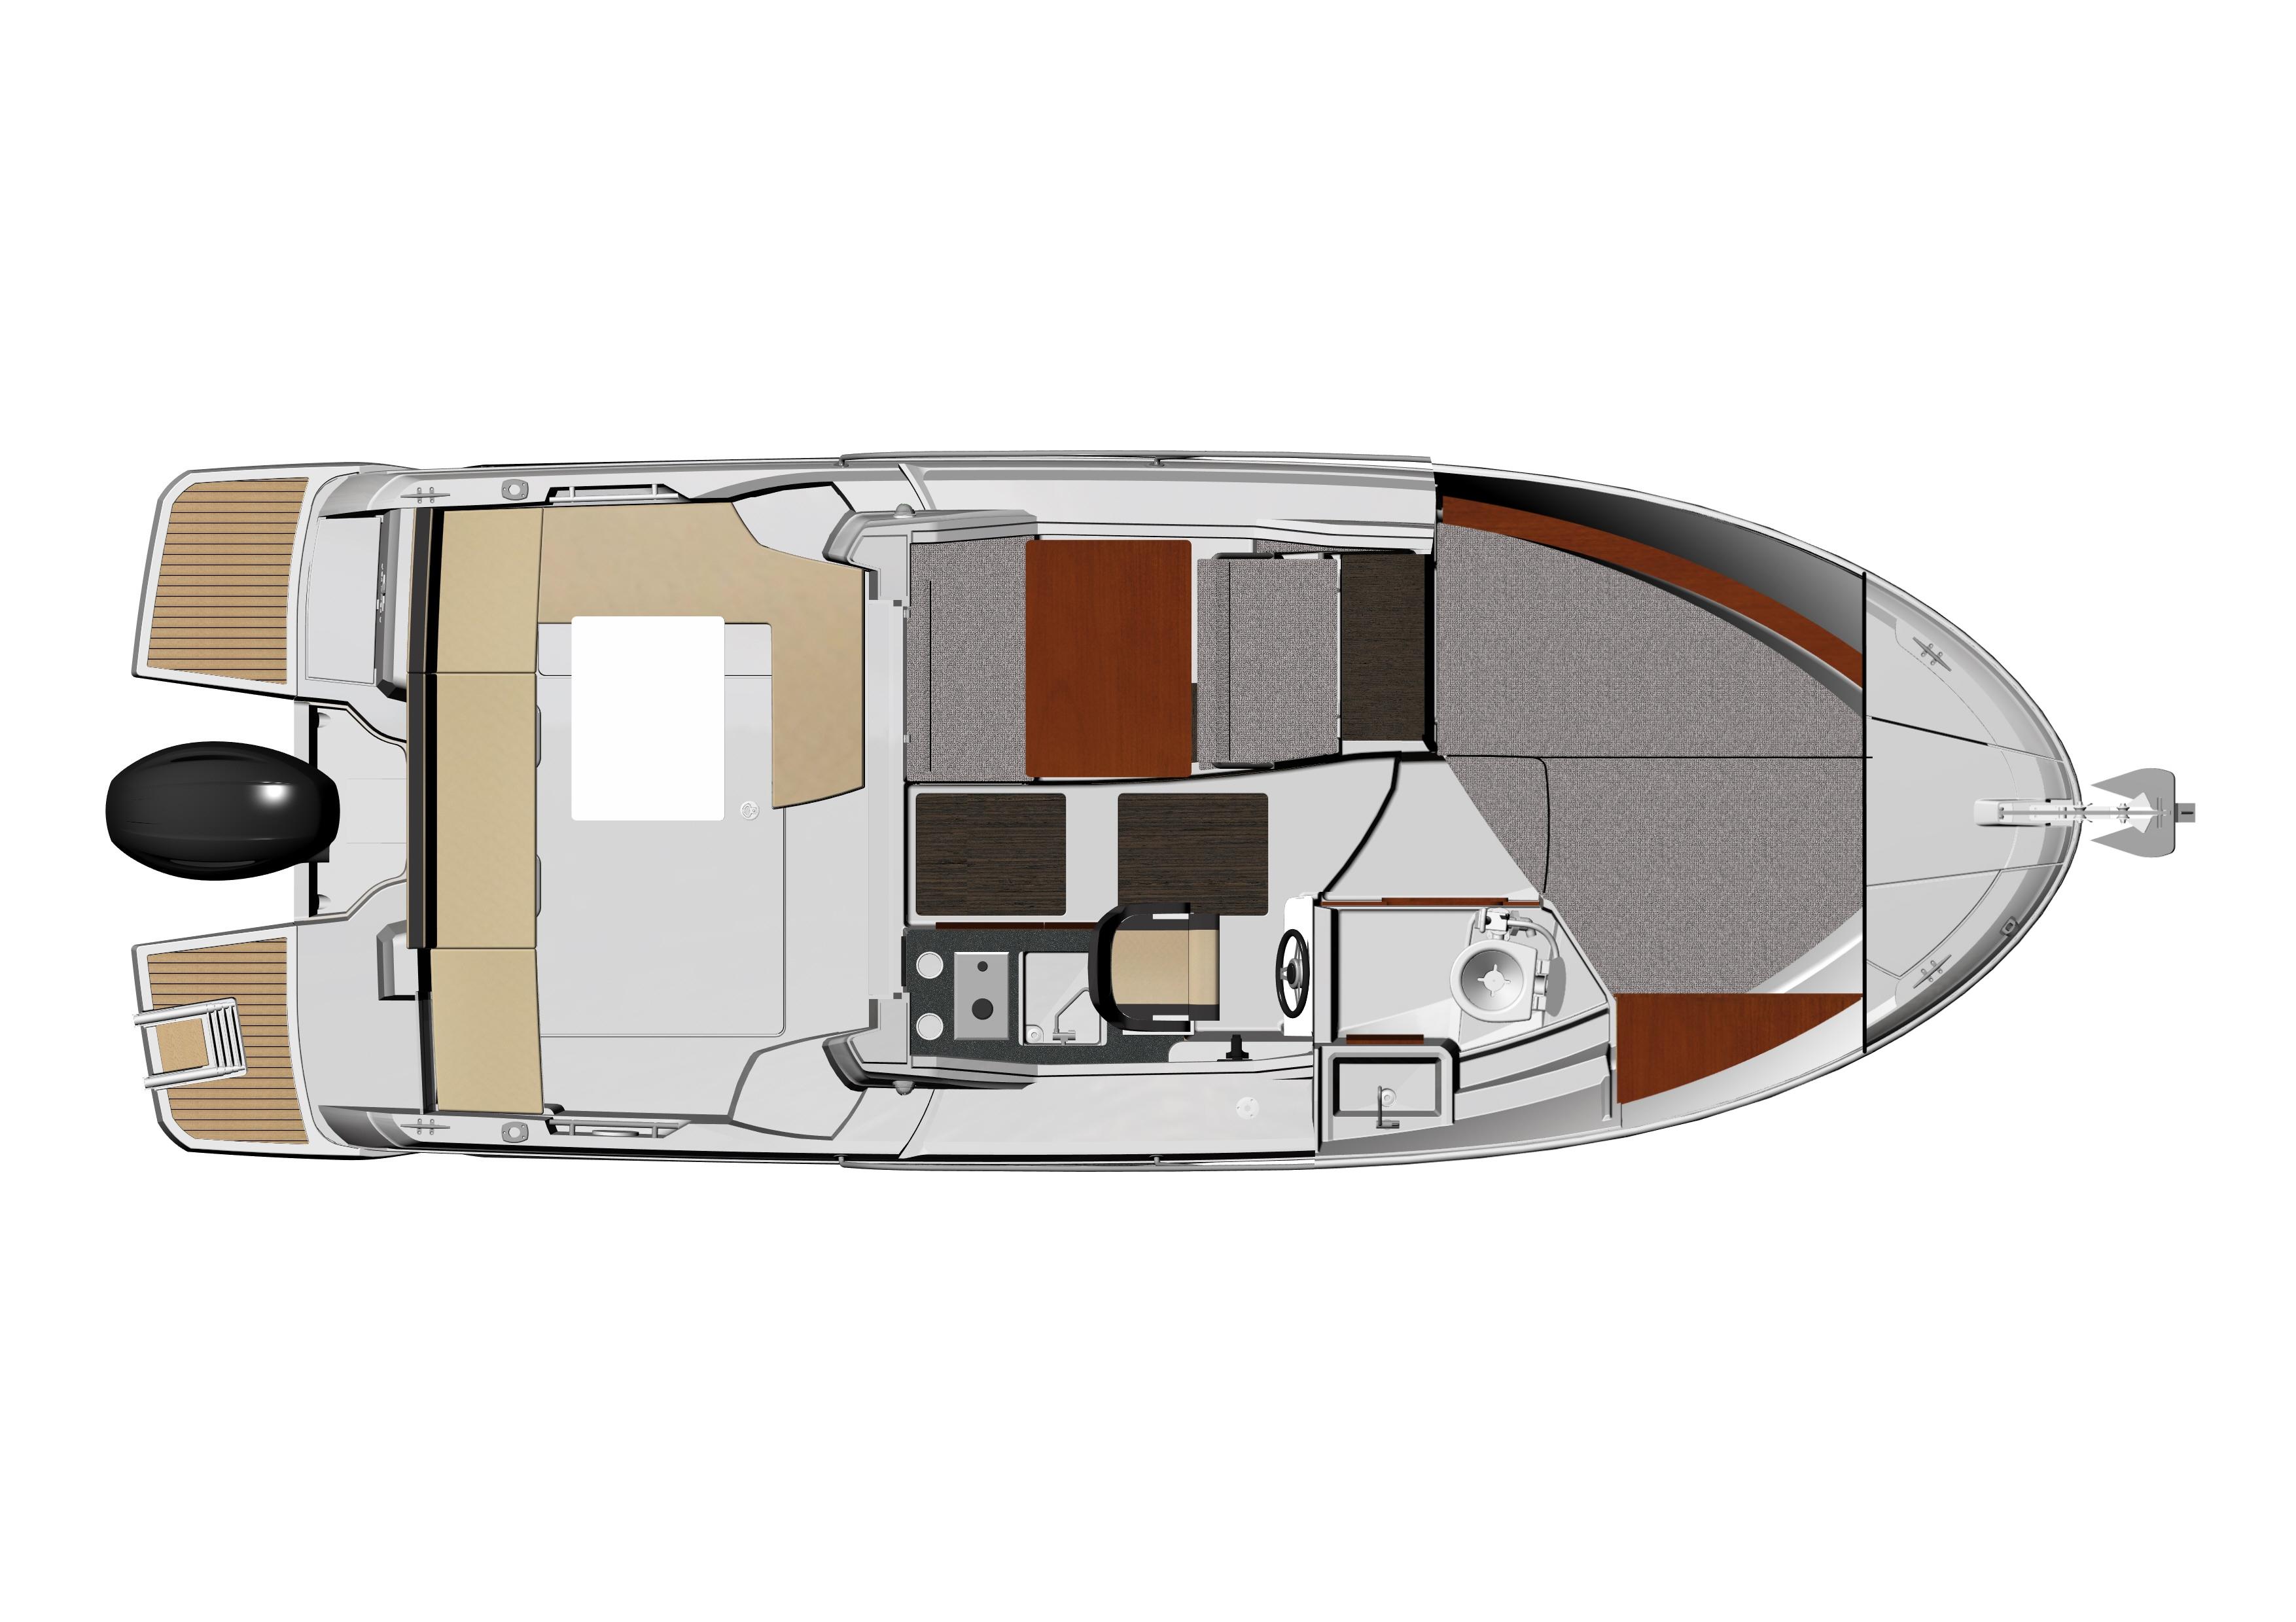 4_-MF795_-TOP-copilot-and-cabin-berth-